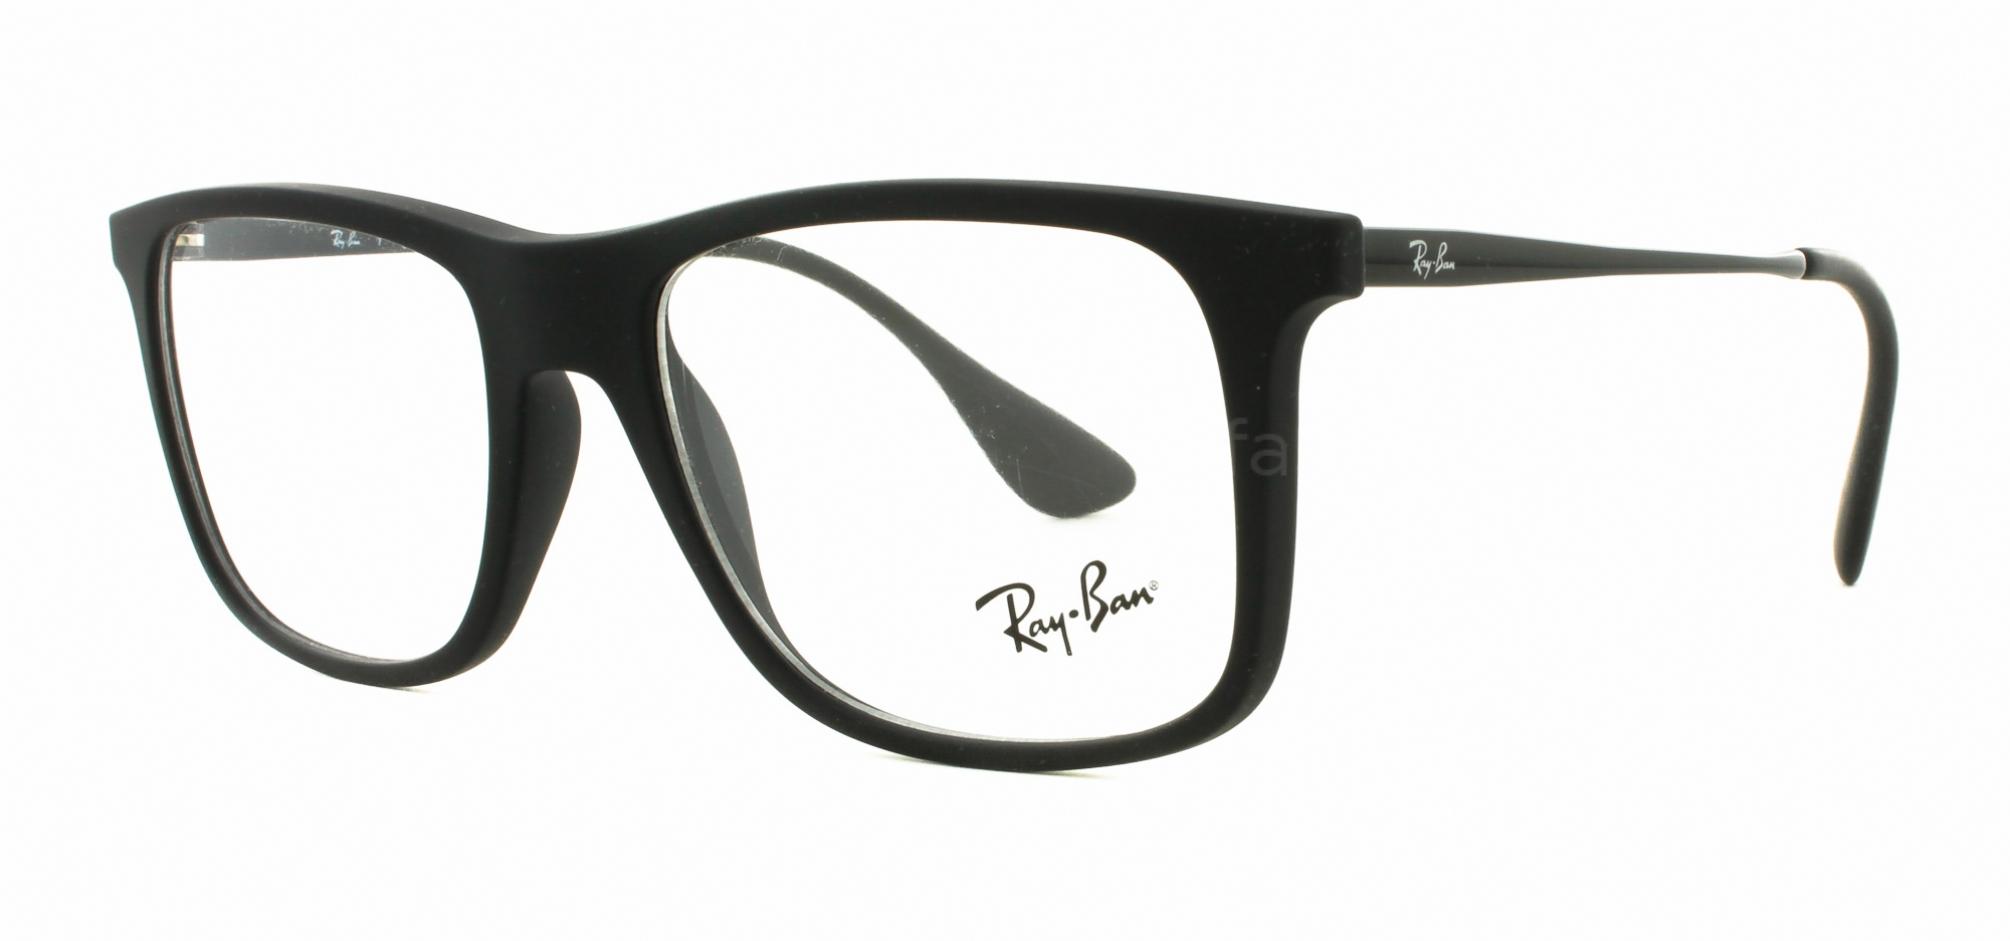 2f25b72e68661 Ray Ban 7054 Eyeglasses